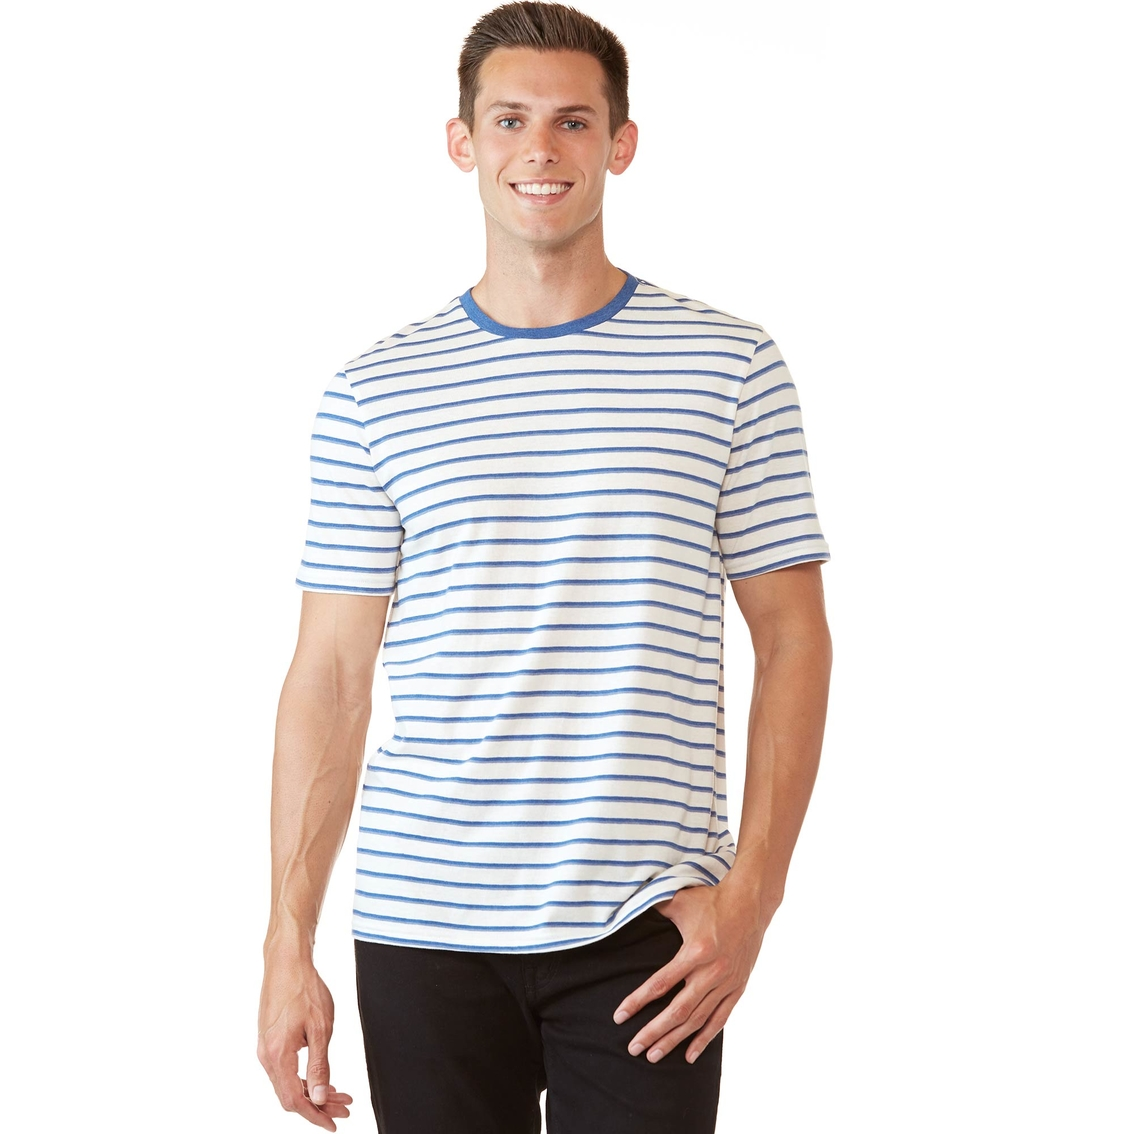 Union Jack Girl Short-Sleeve Crewneck Polyester T-Shirt,Classical Ele